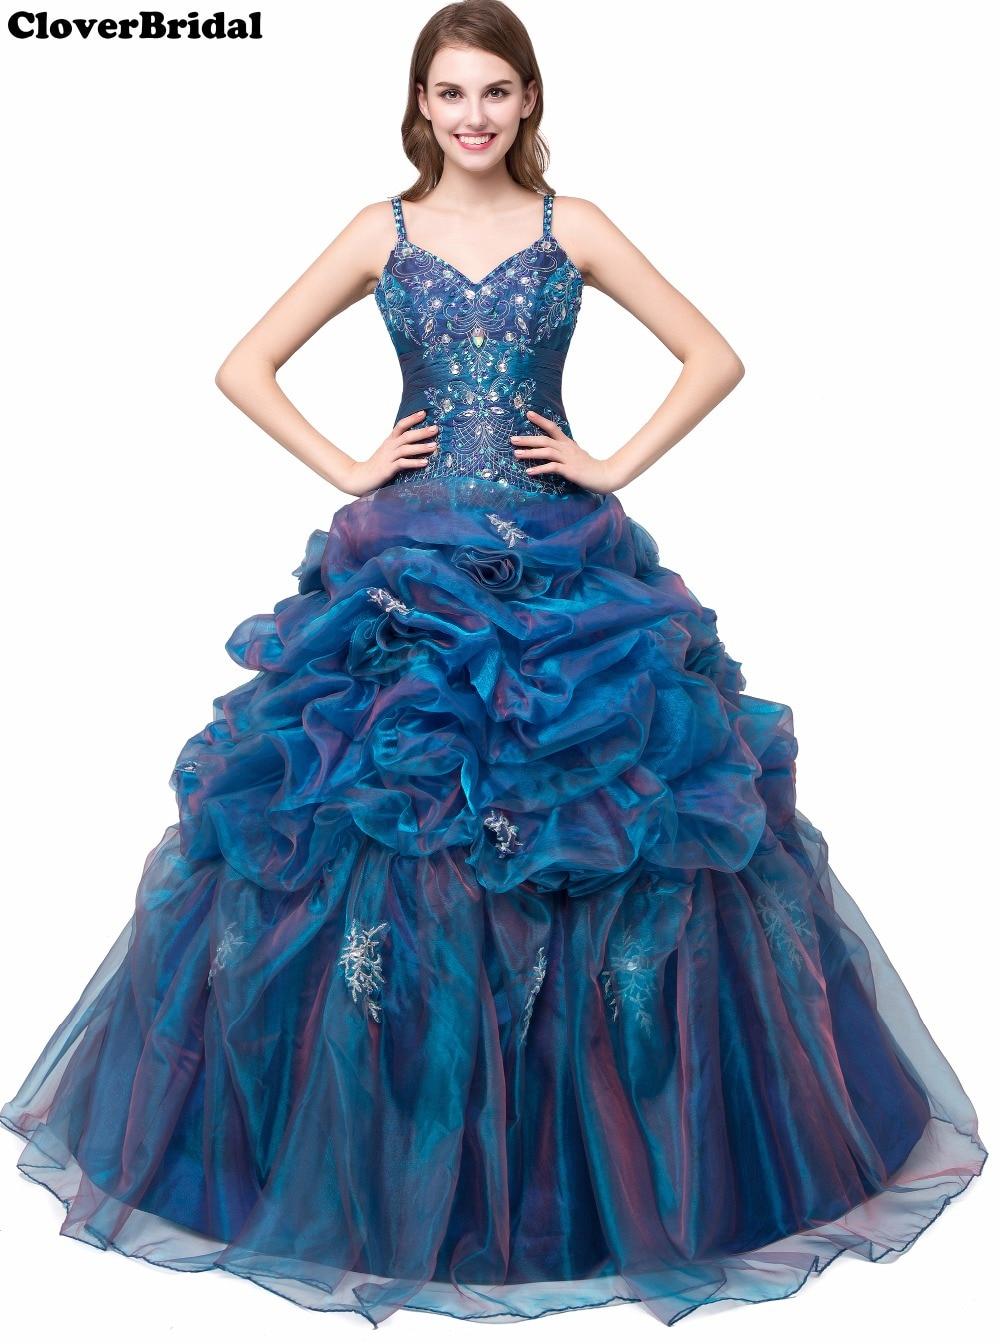 New Luxury Spagetti cinghie Sweetheart Wedding Party Dress Beaded Ruffled Organza Ball Gown Abiti colorati